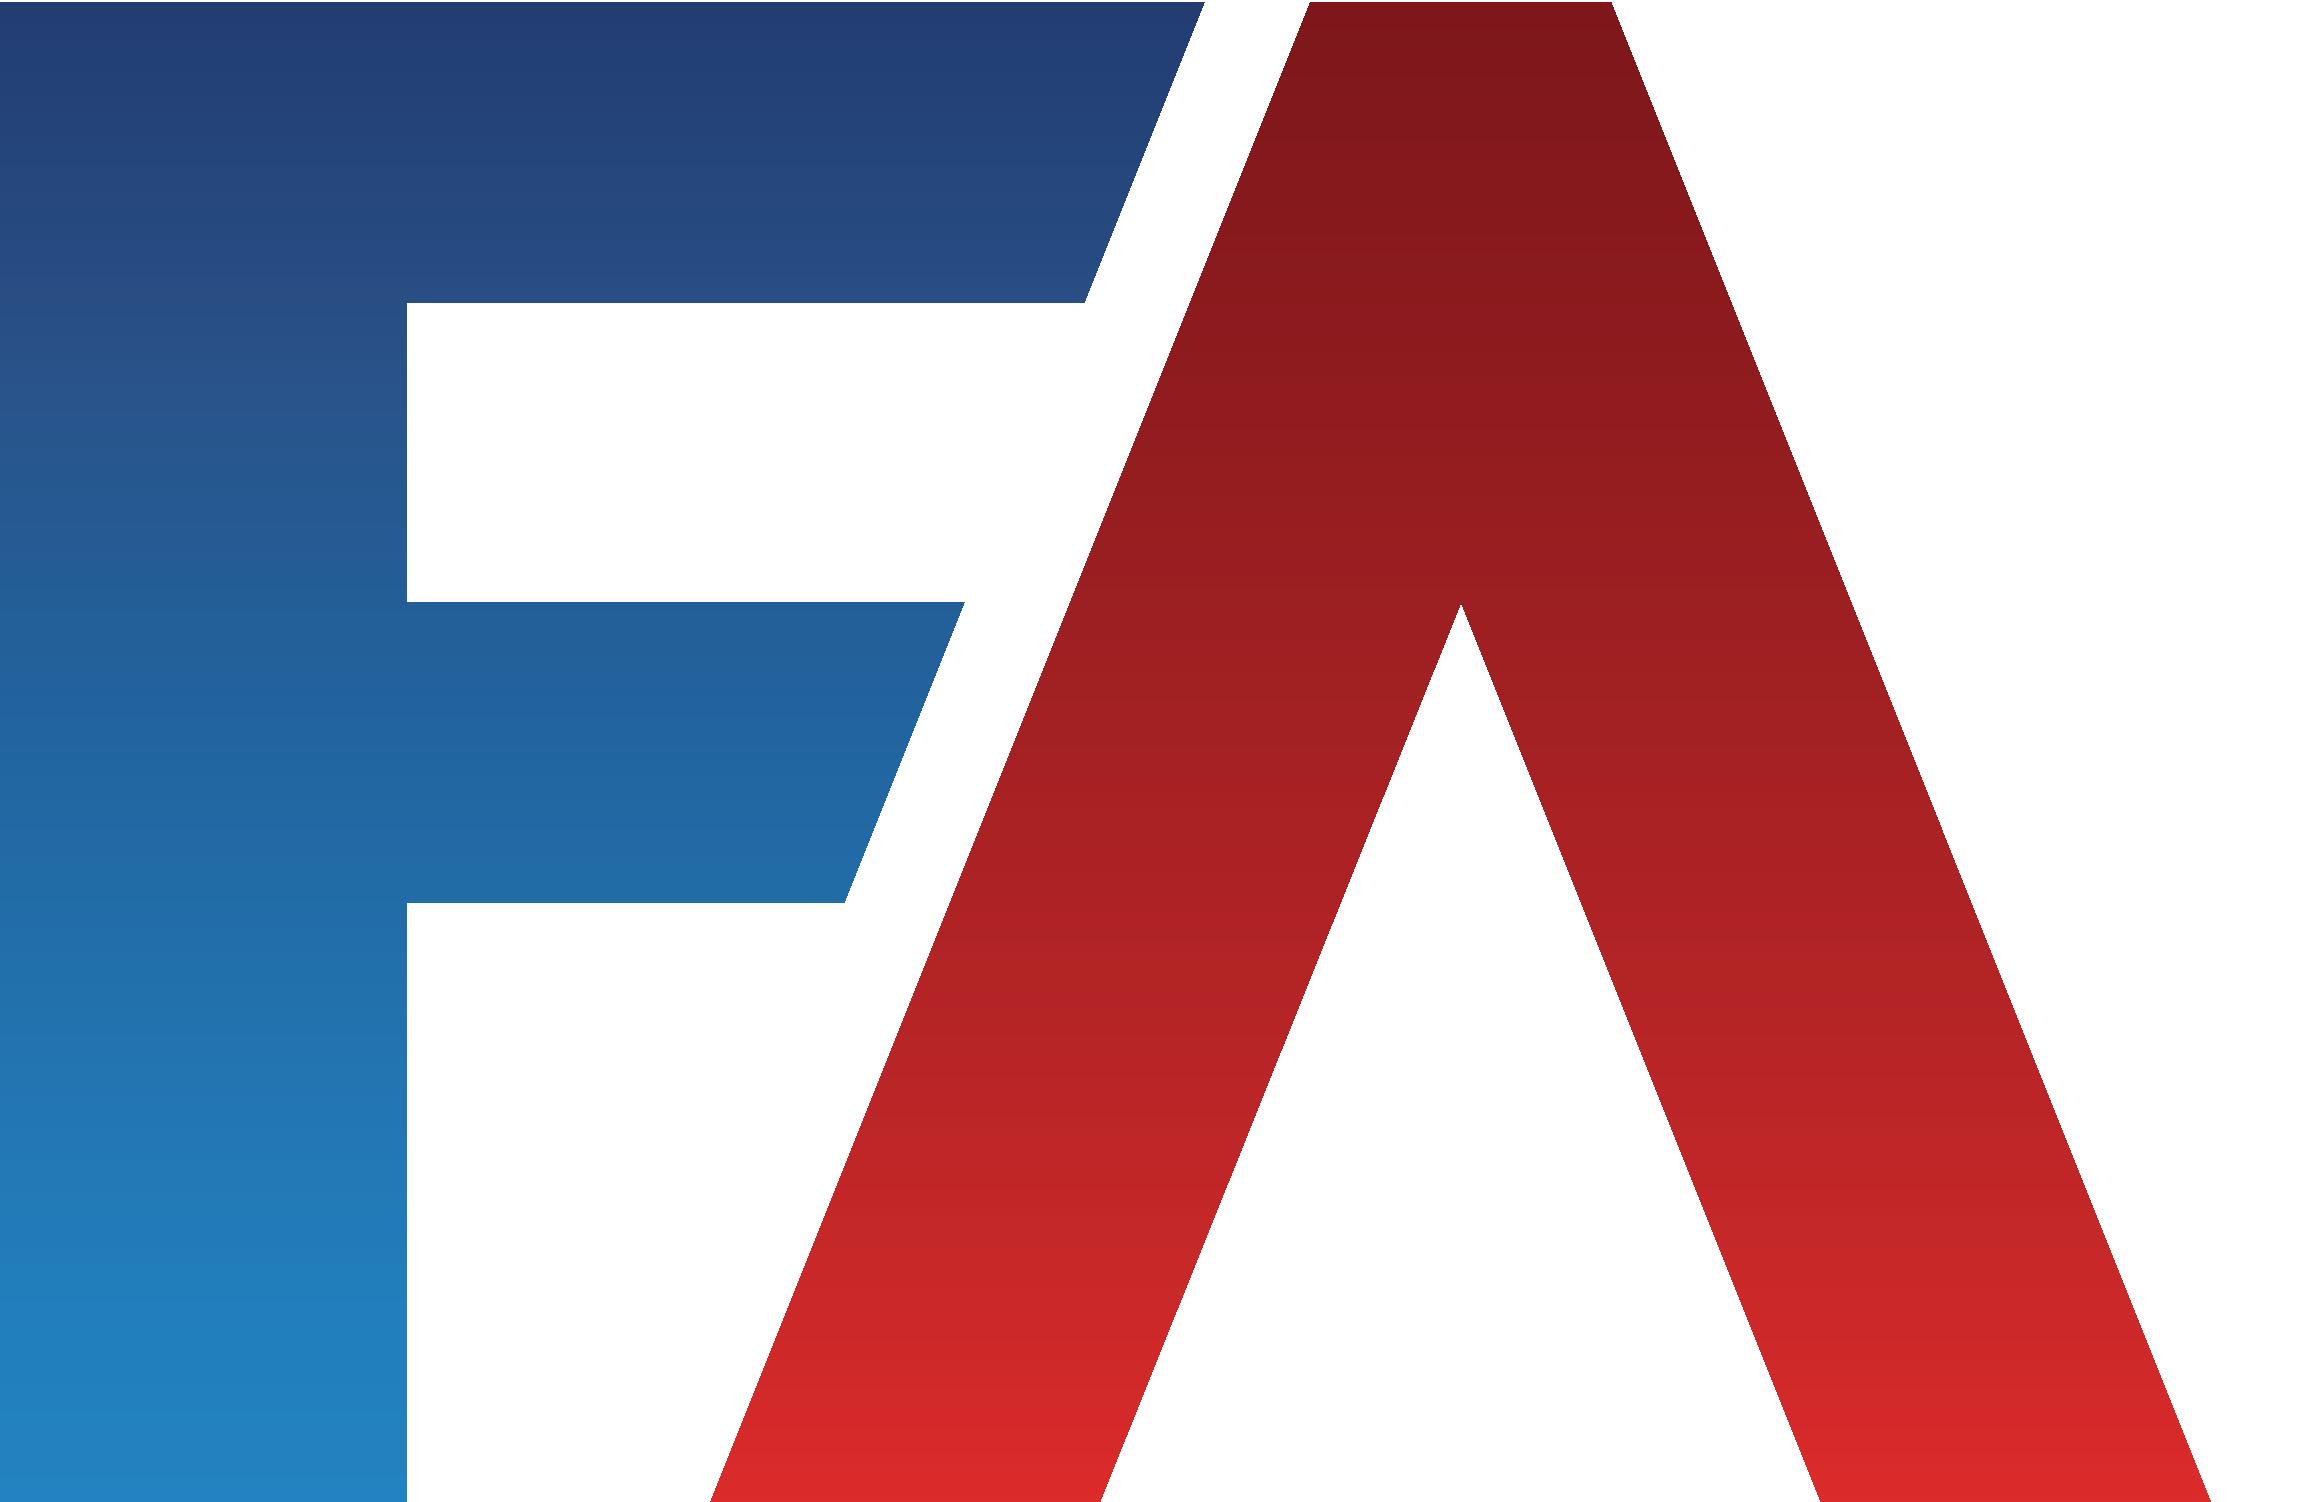 2016 MLB Draft Guide: The Art of the Deal | FantasyAlarm.com